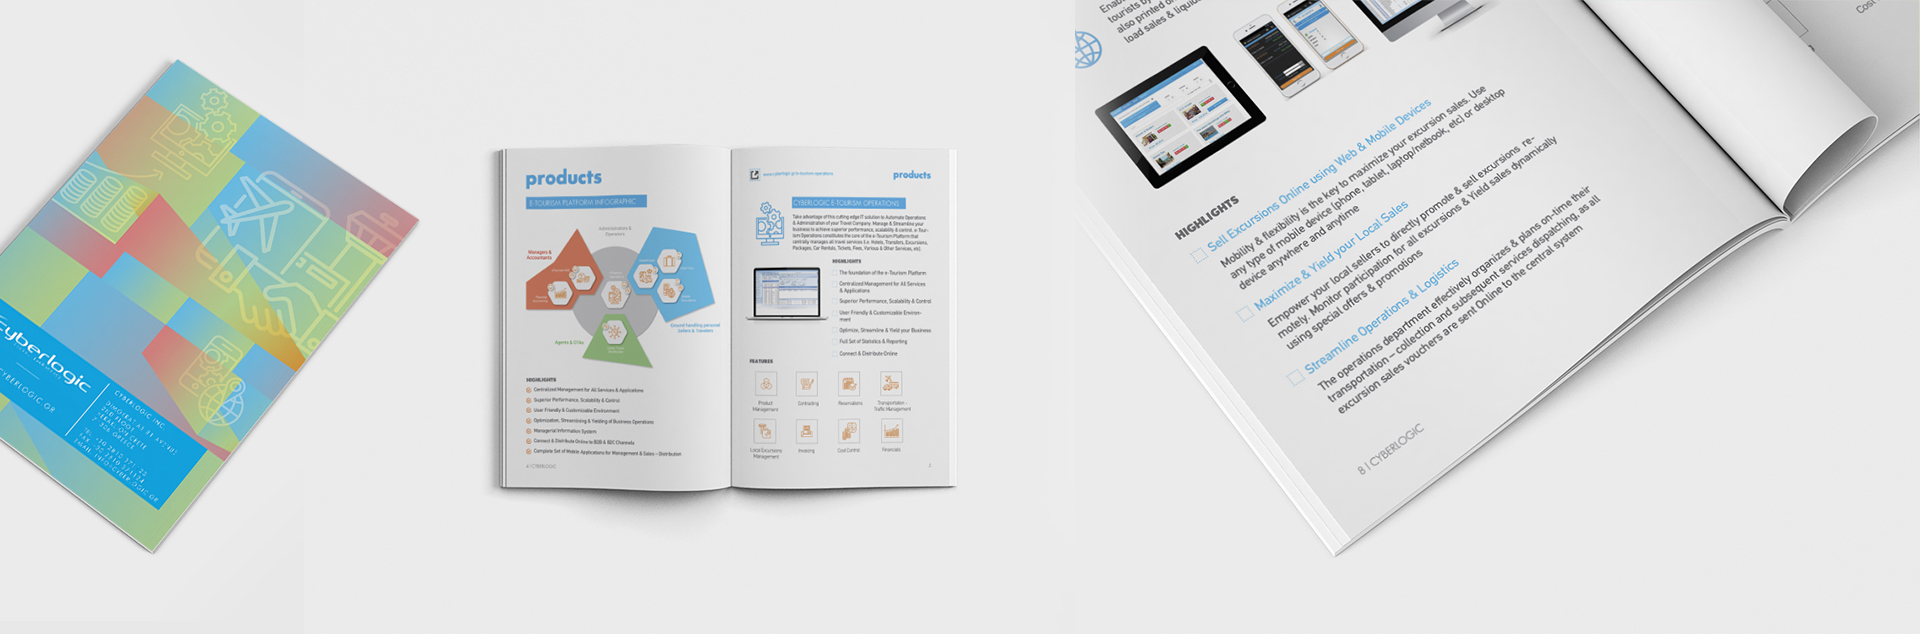 cyberlogic-flyer